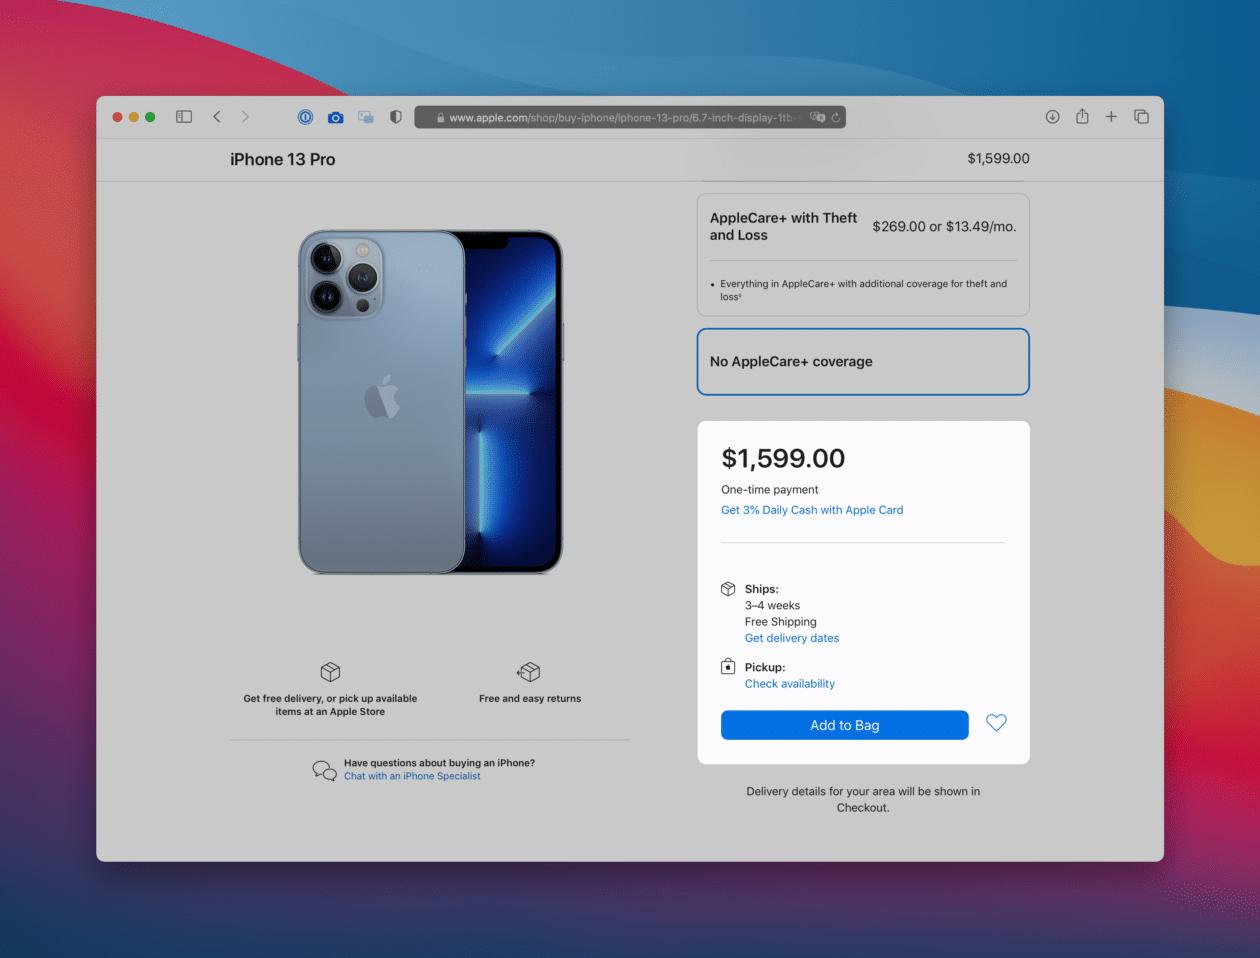 Pré-venda dos iPhones 13 nos Estados Unidos